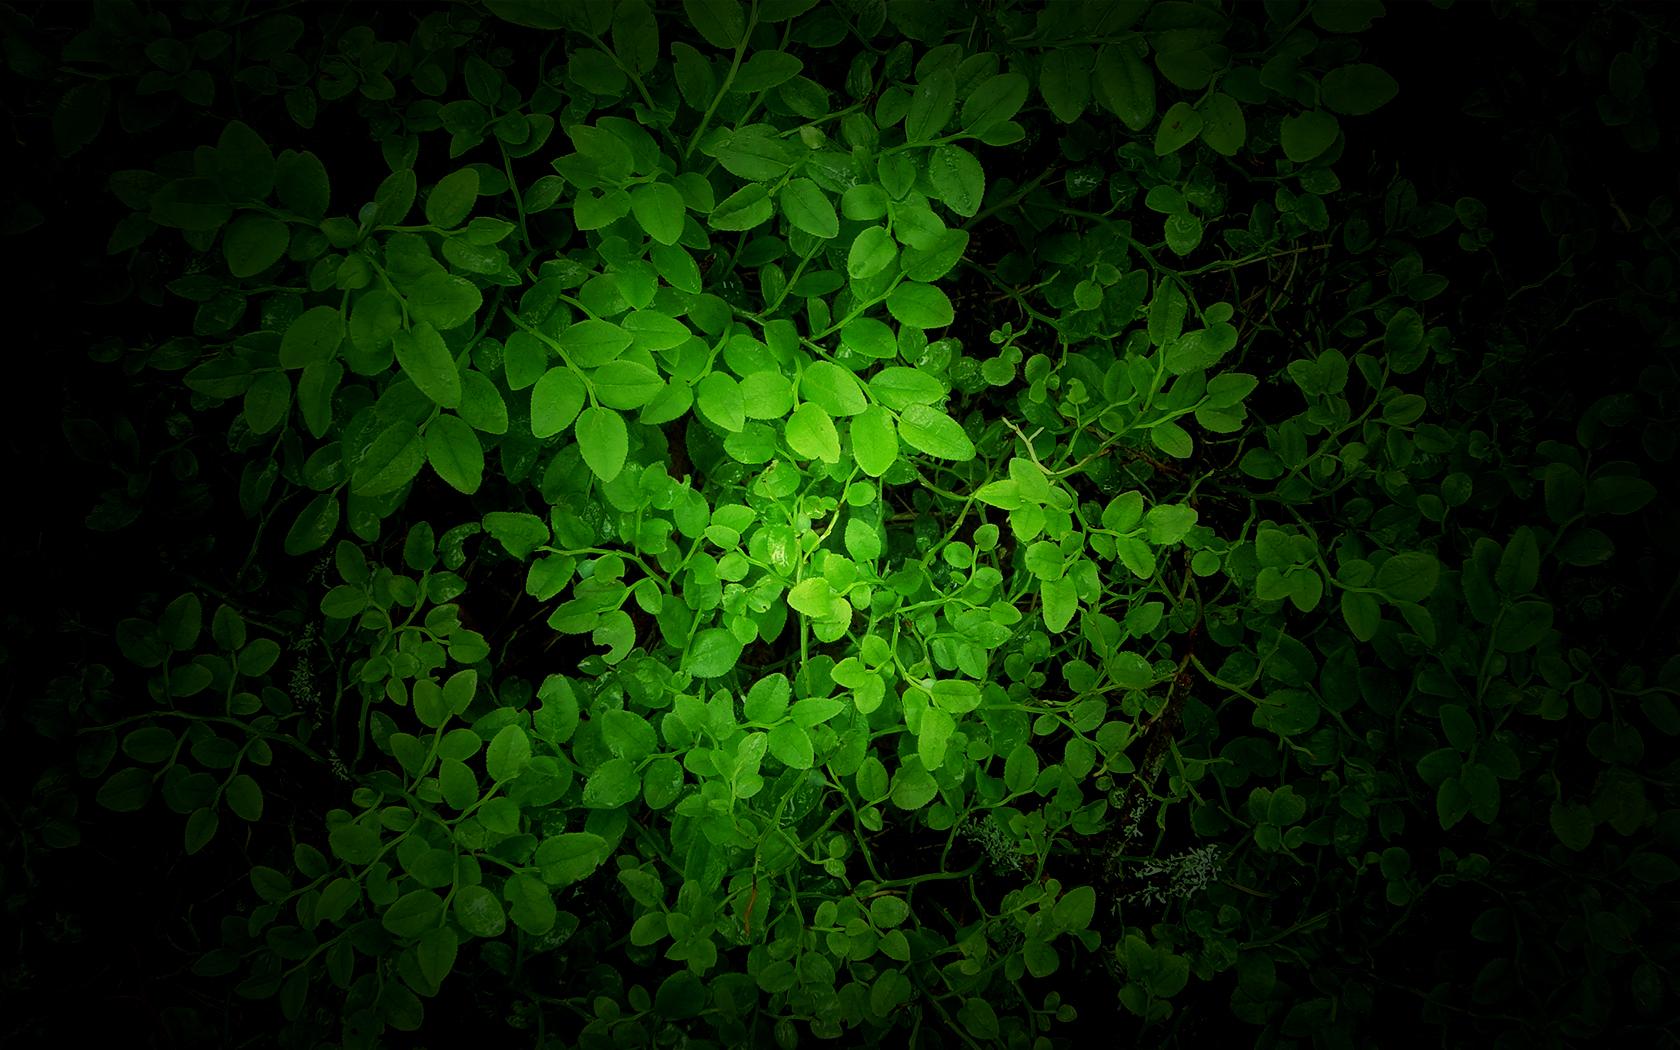 Green Wallpaper By Mikkoliini